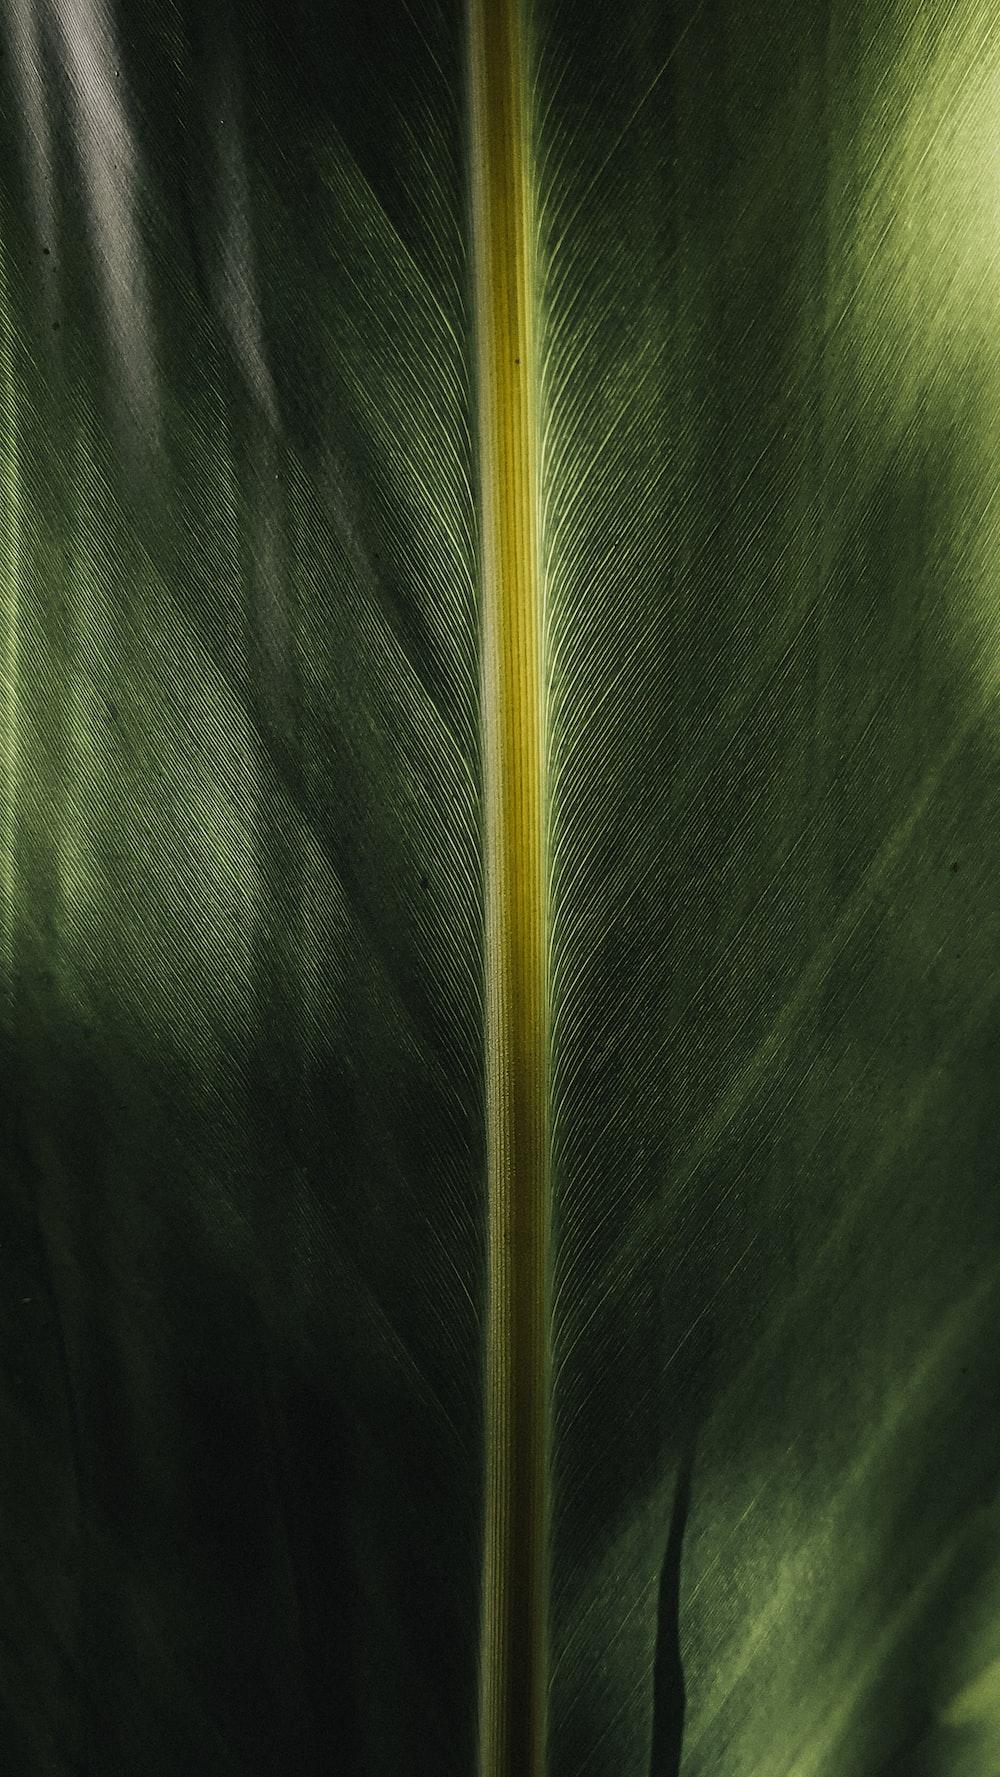 yellow stick on green textile